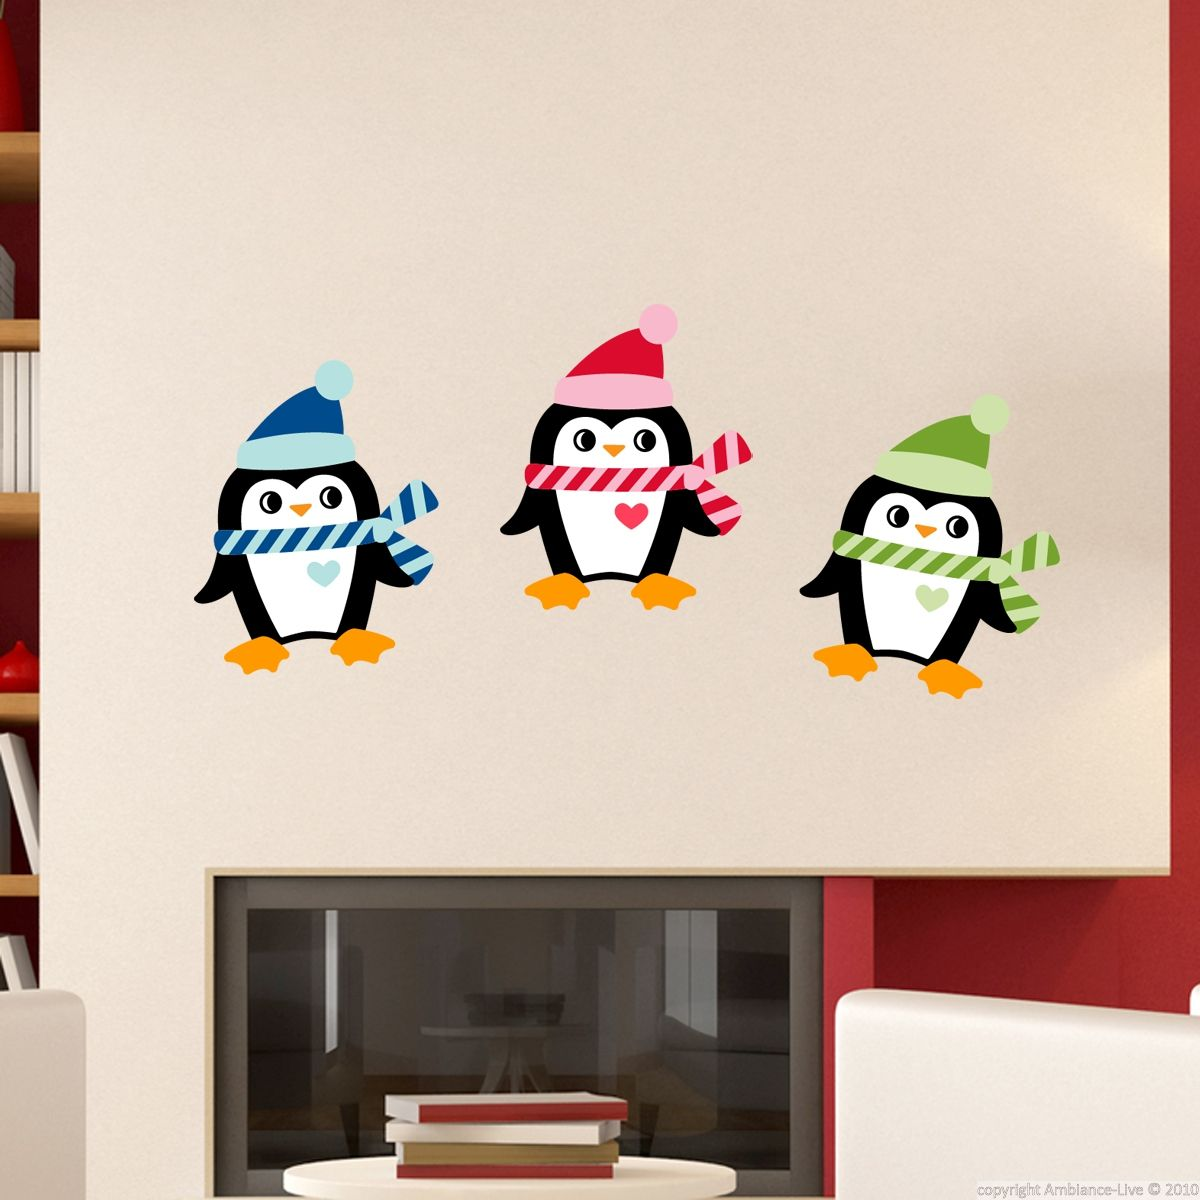 Stickers Decoratifs Pour Noel Sticker Pingouins De Noel Ambiance